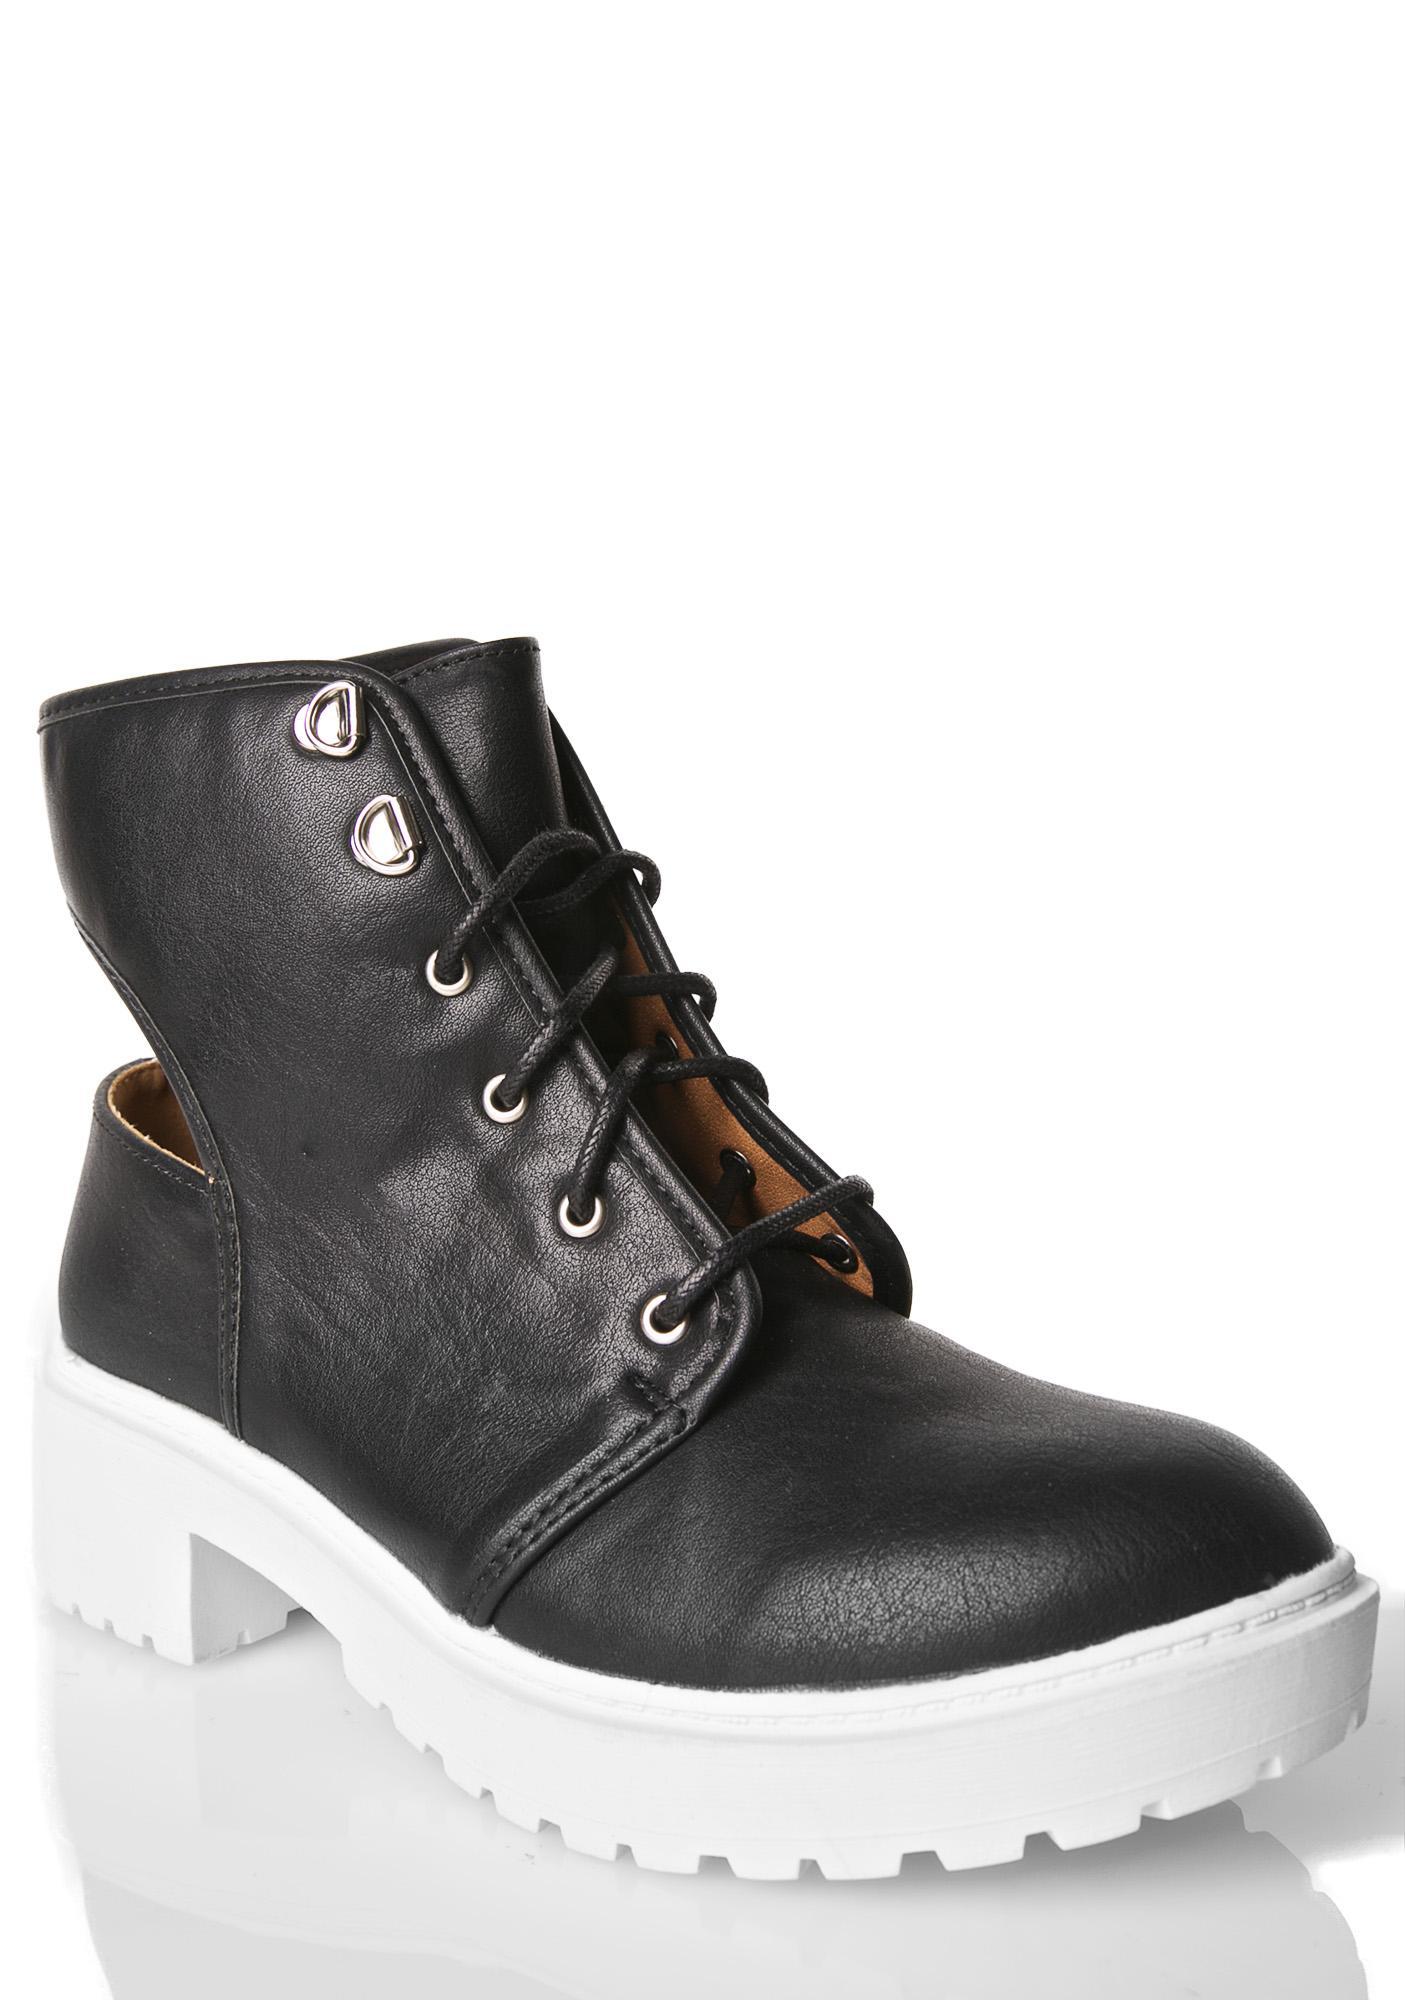 Kira Cut-Out Boots